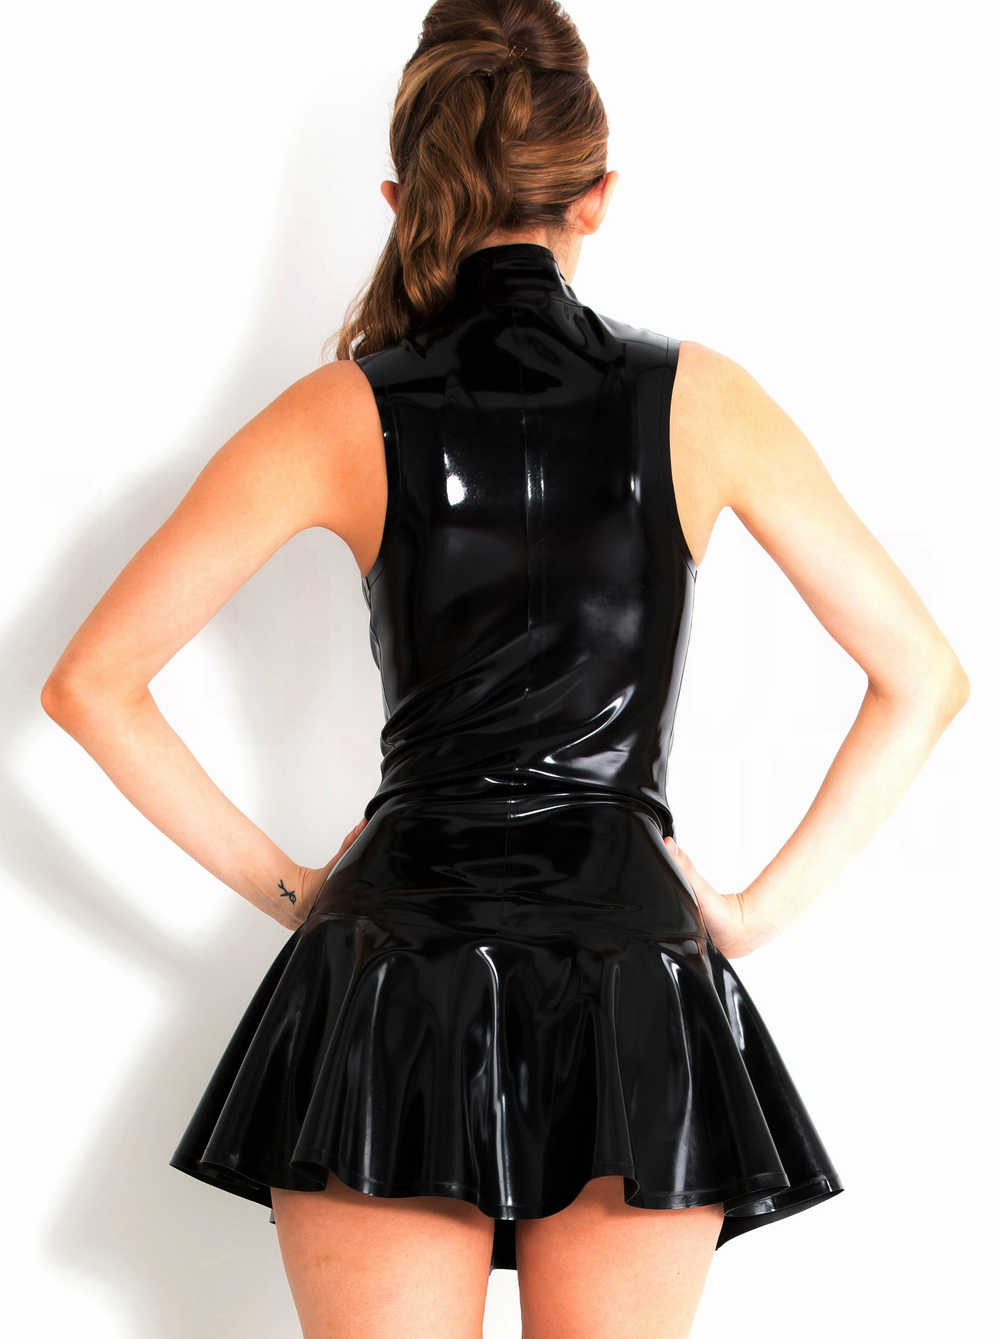 39cdecb61c627 Women Plus Size Wet Look Dress PVC Leather Pleated Dresses Sleeveless Latex  Bondage Catsuit Pole Dance Dress Clubwear